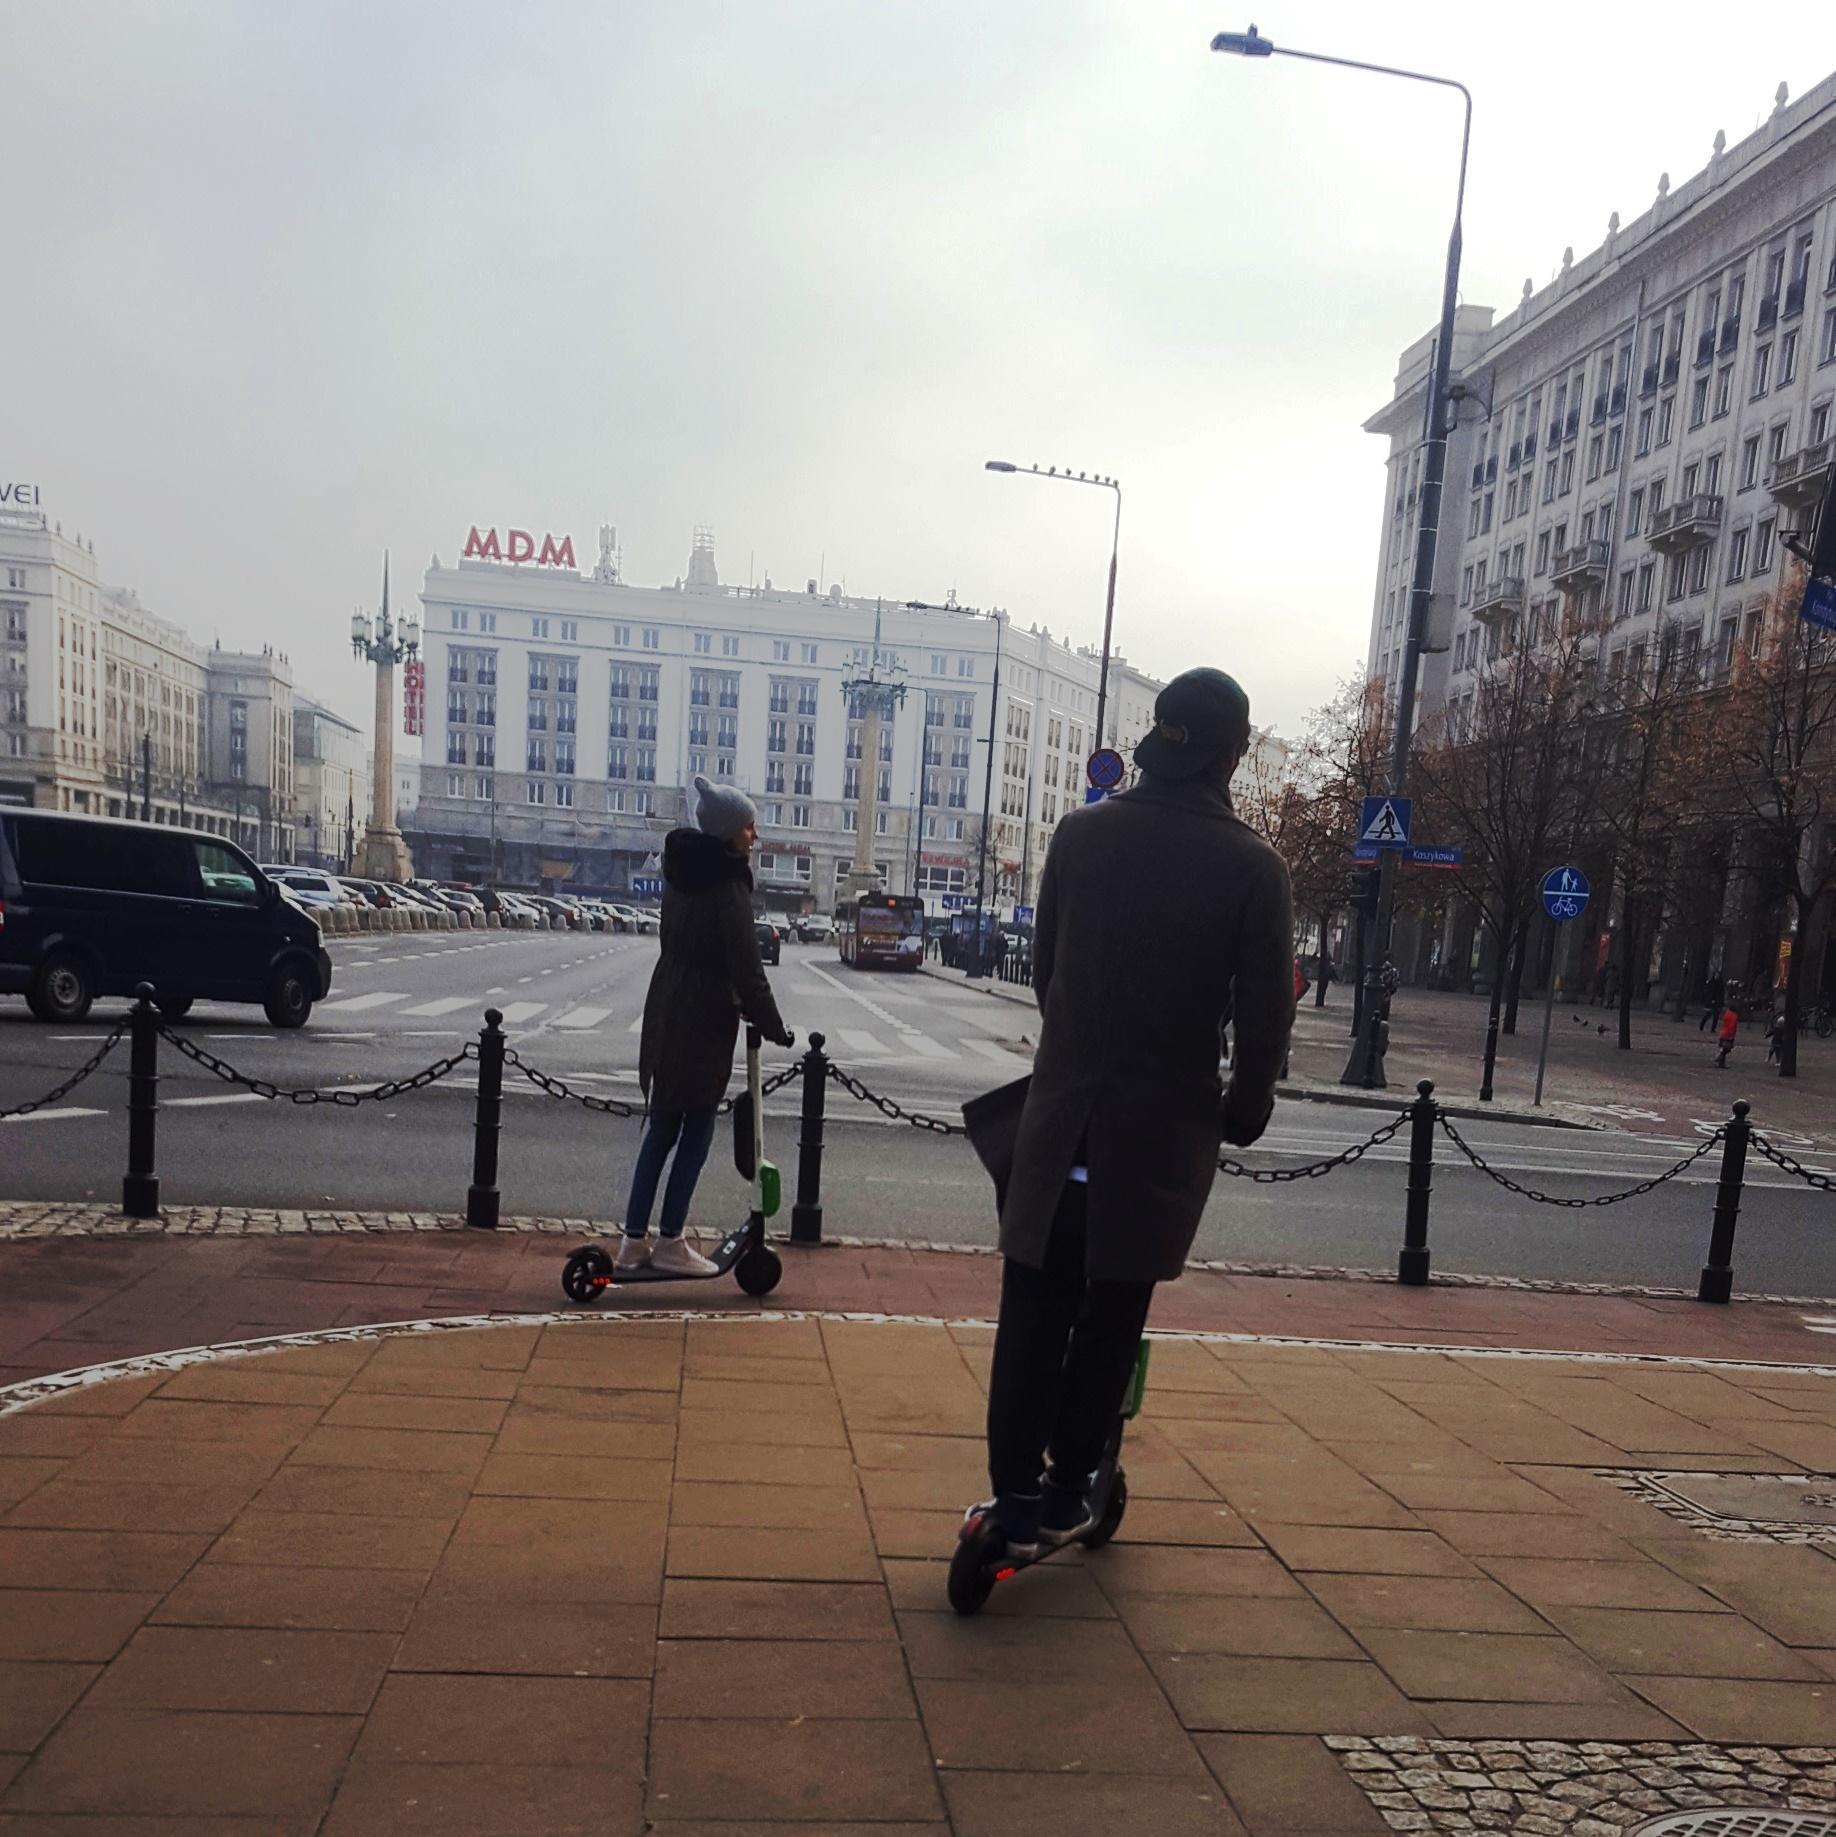 monopattino a noleggio a Varsavia Erasmus